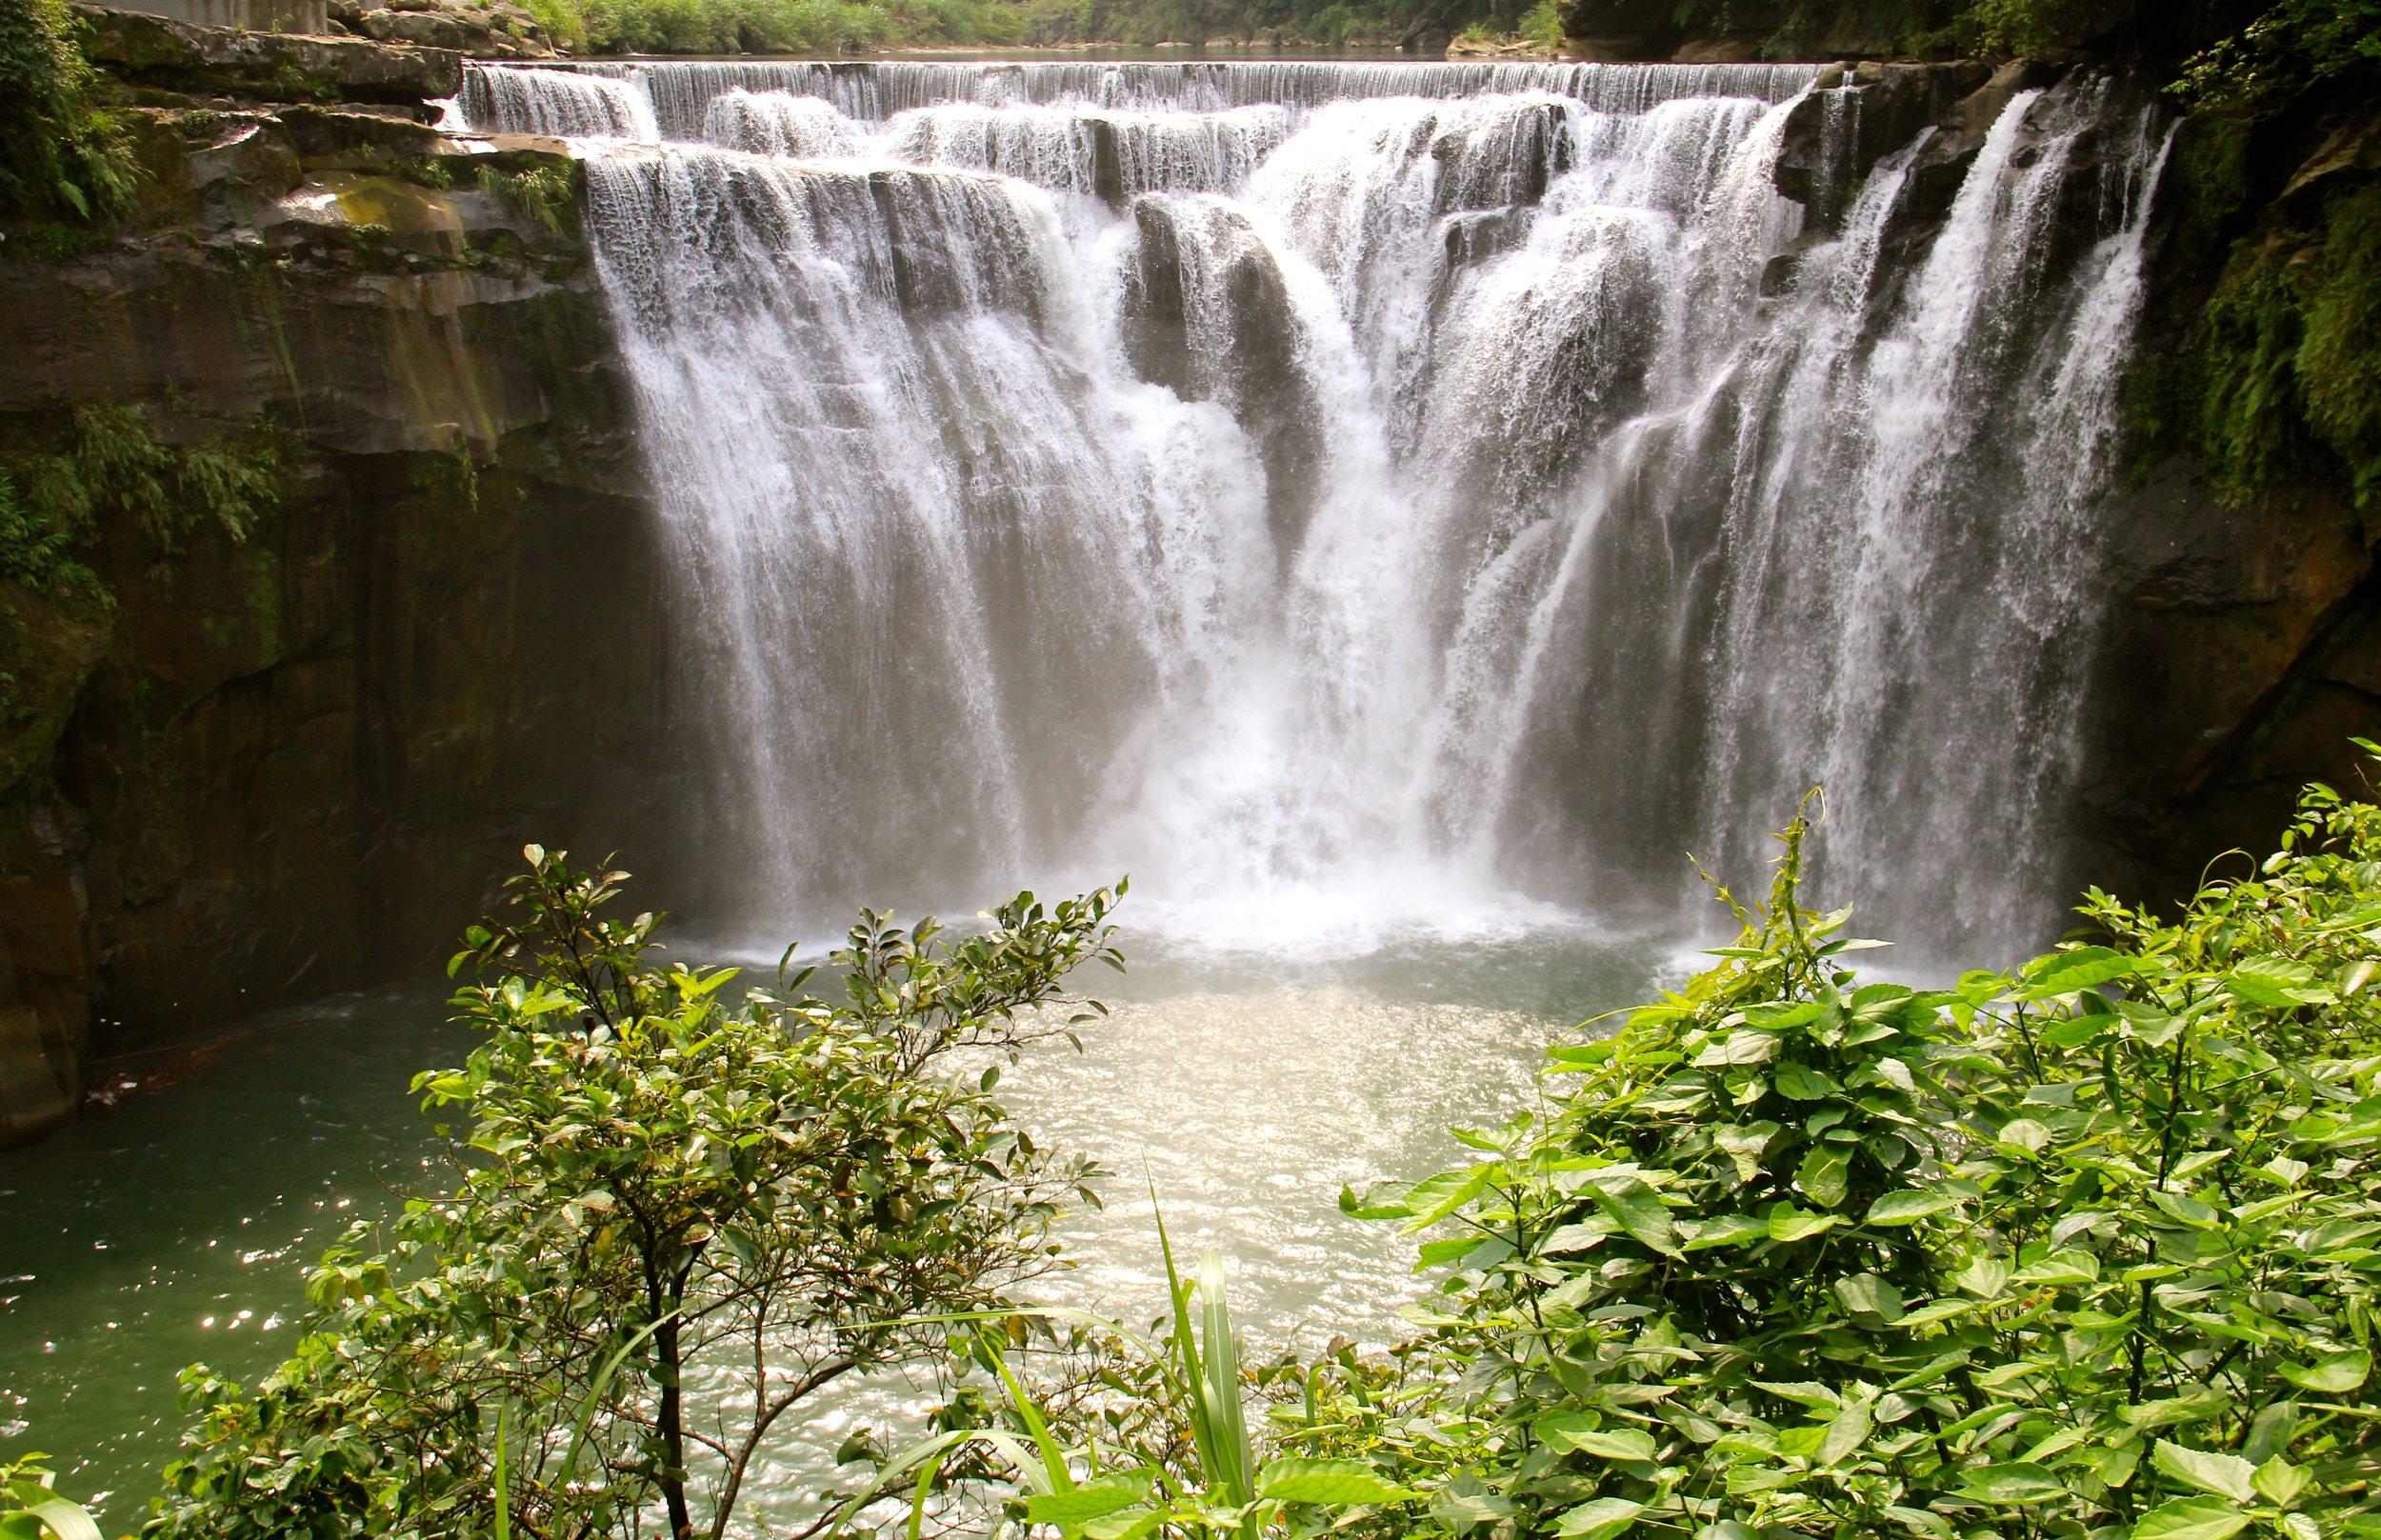 Shifen Waterfall, New Taipei City, Taiwan